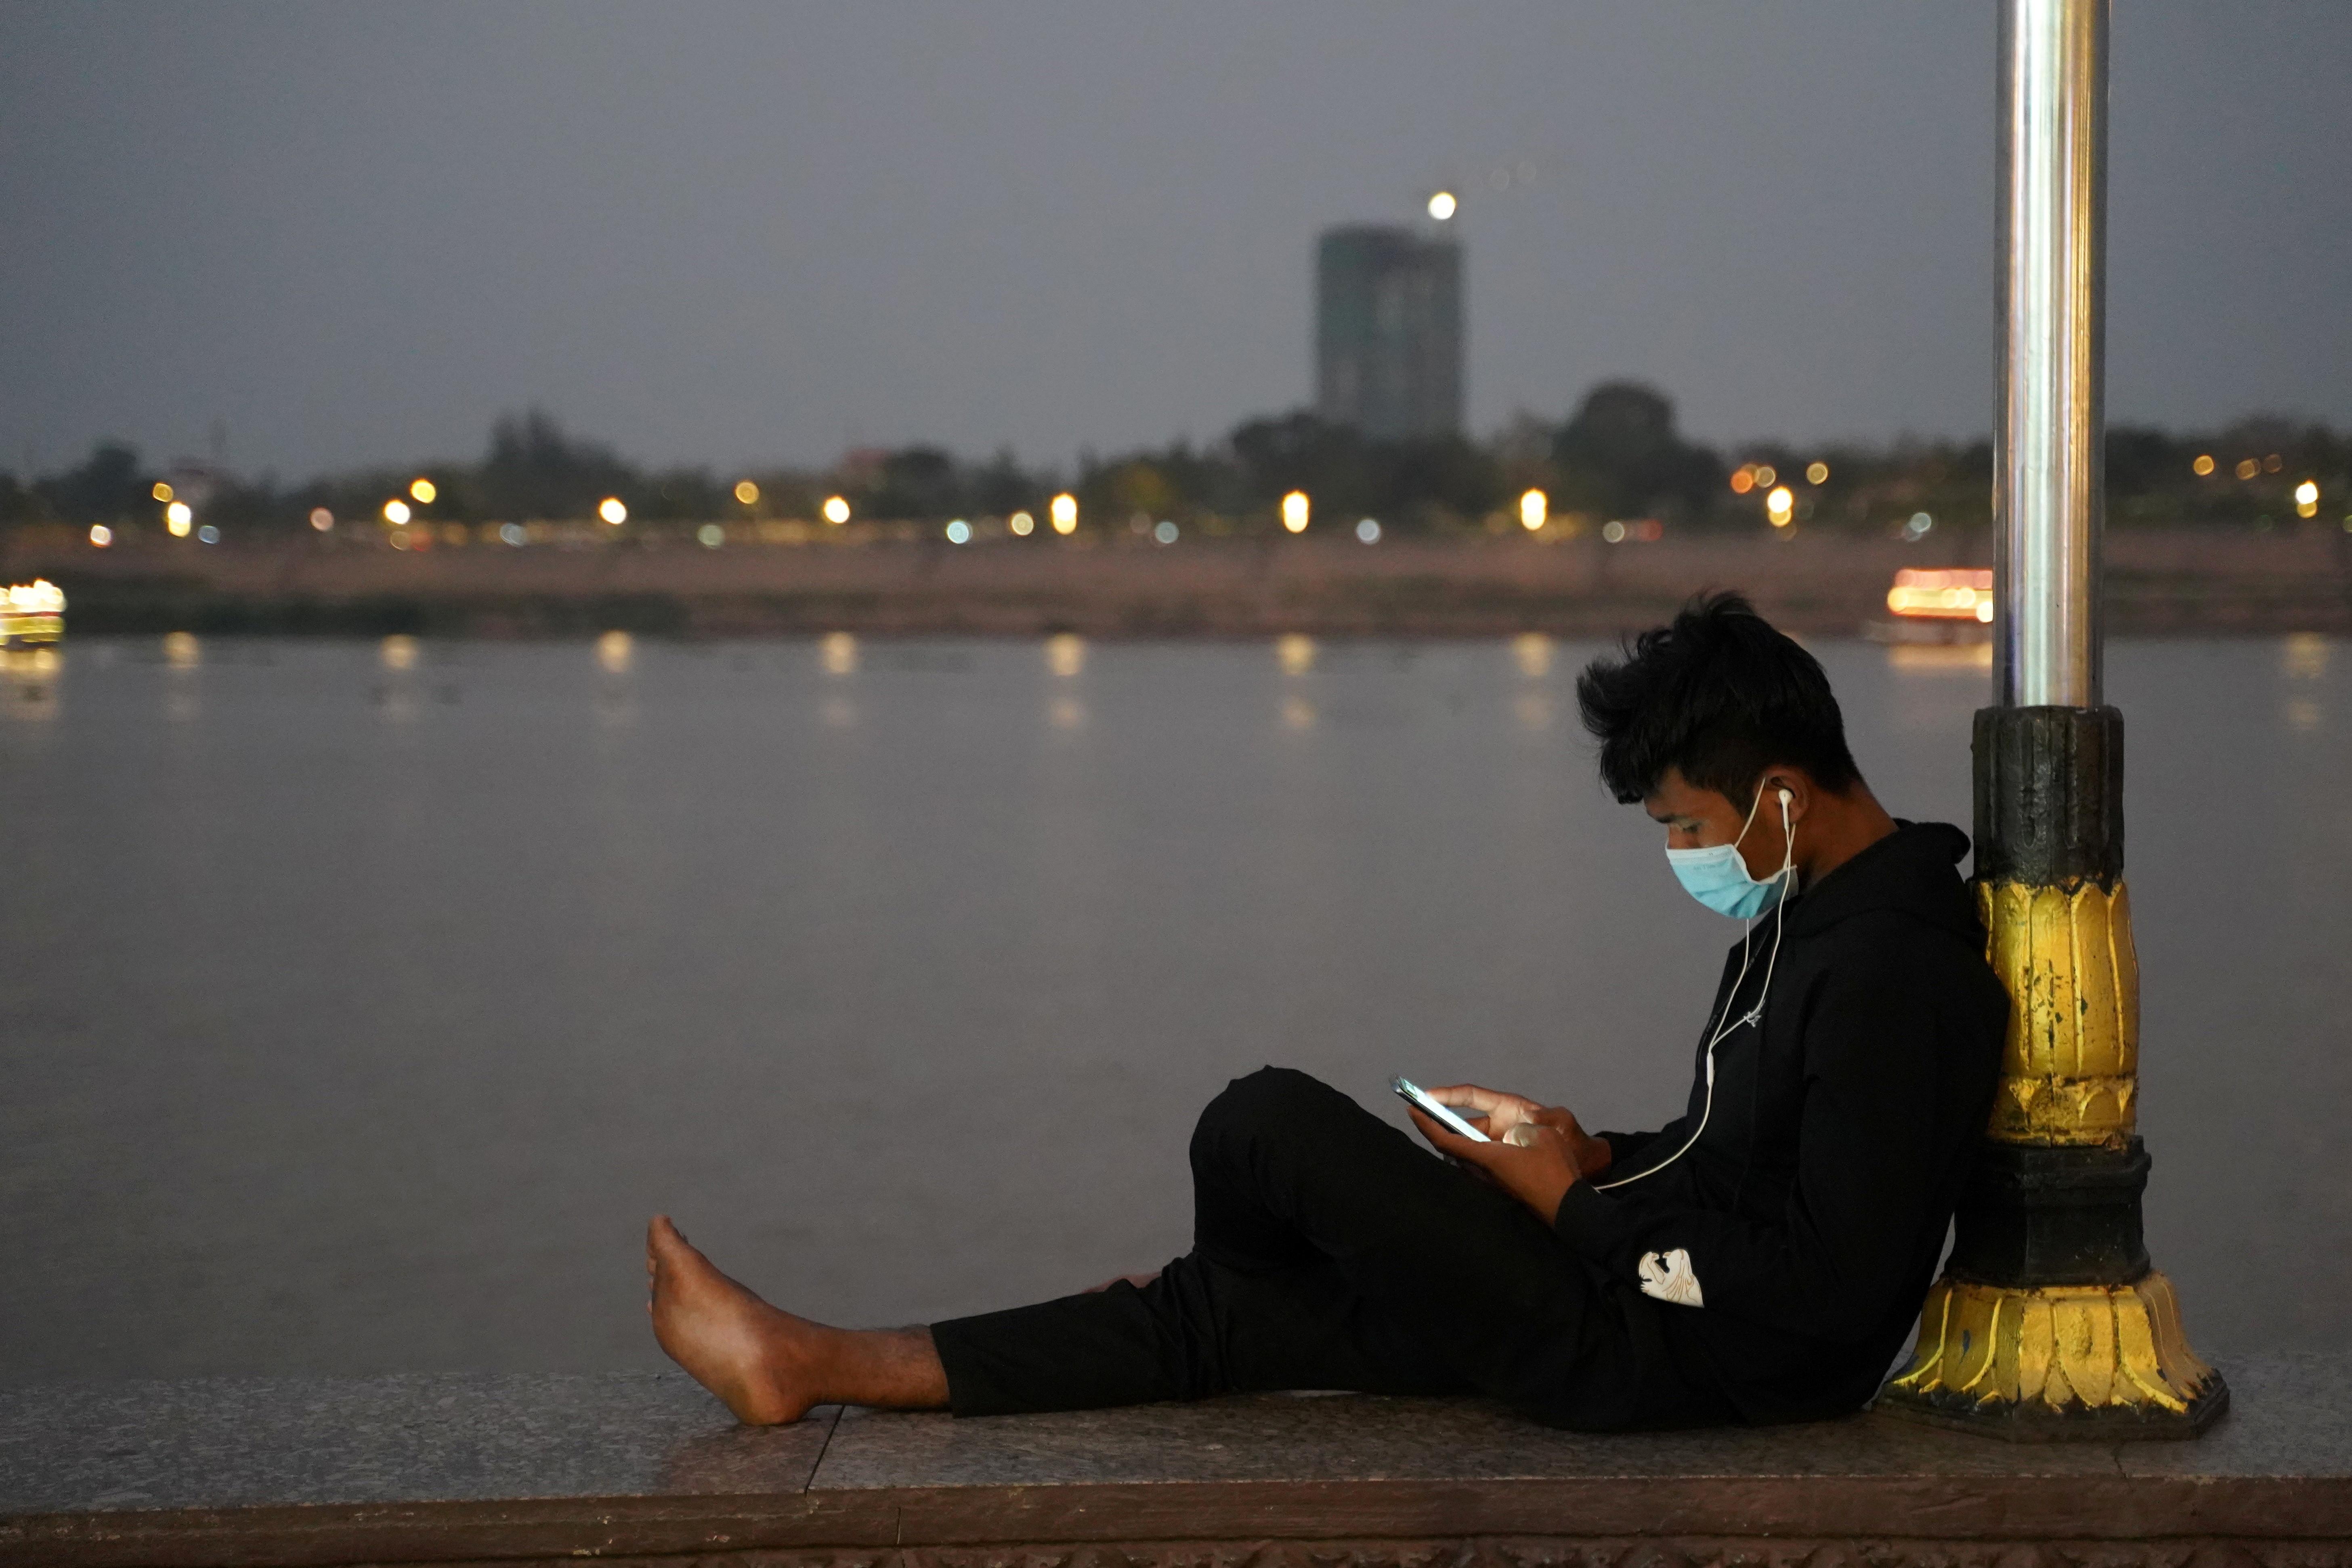 A man uses his mobile phone on the Tonle Sap riverside amid the coronavirus pandemic in Phnom Penh, Cambodia, February 18, 2021. REUTERS/Cindy Liu - RC23VL96NFB3